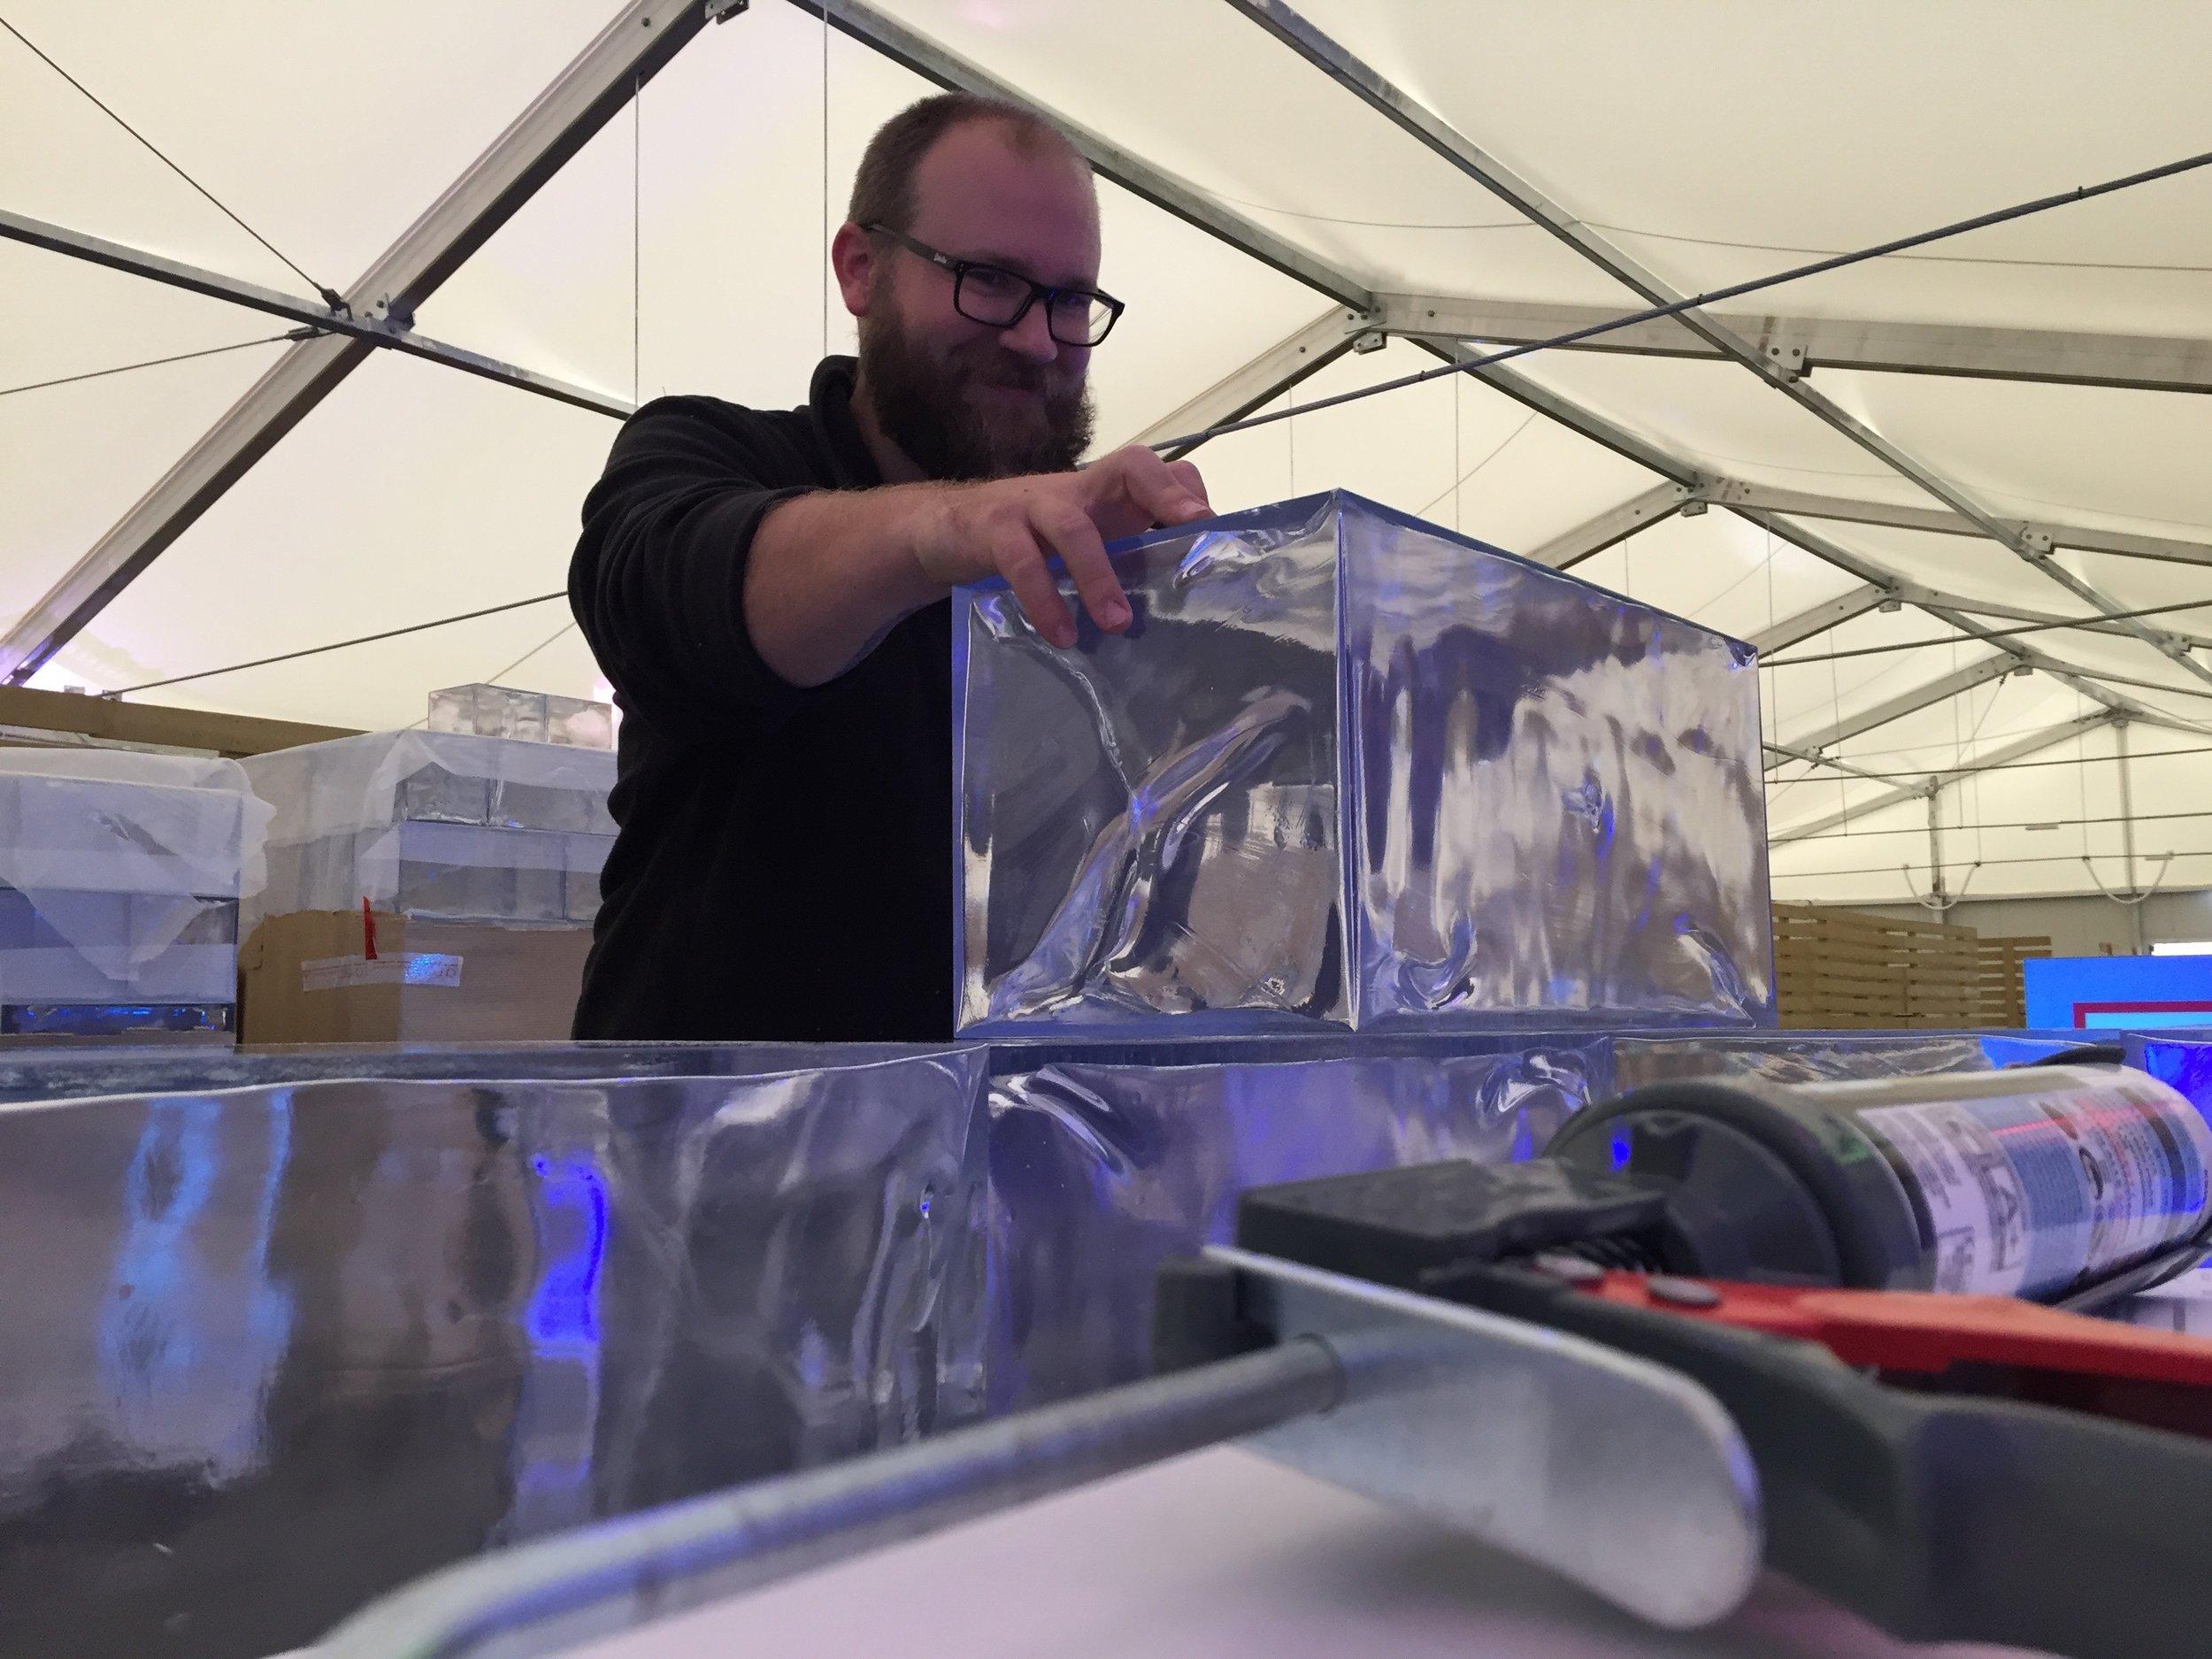 PENGland_Verkauf BRACK IceLounge BRACK.CH Lausanne 1.jpg